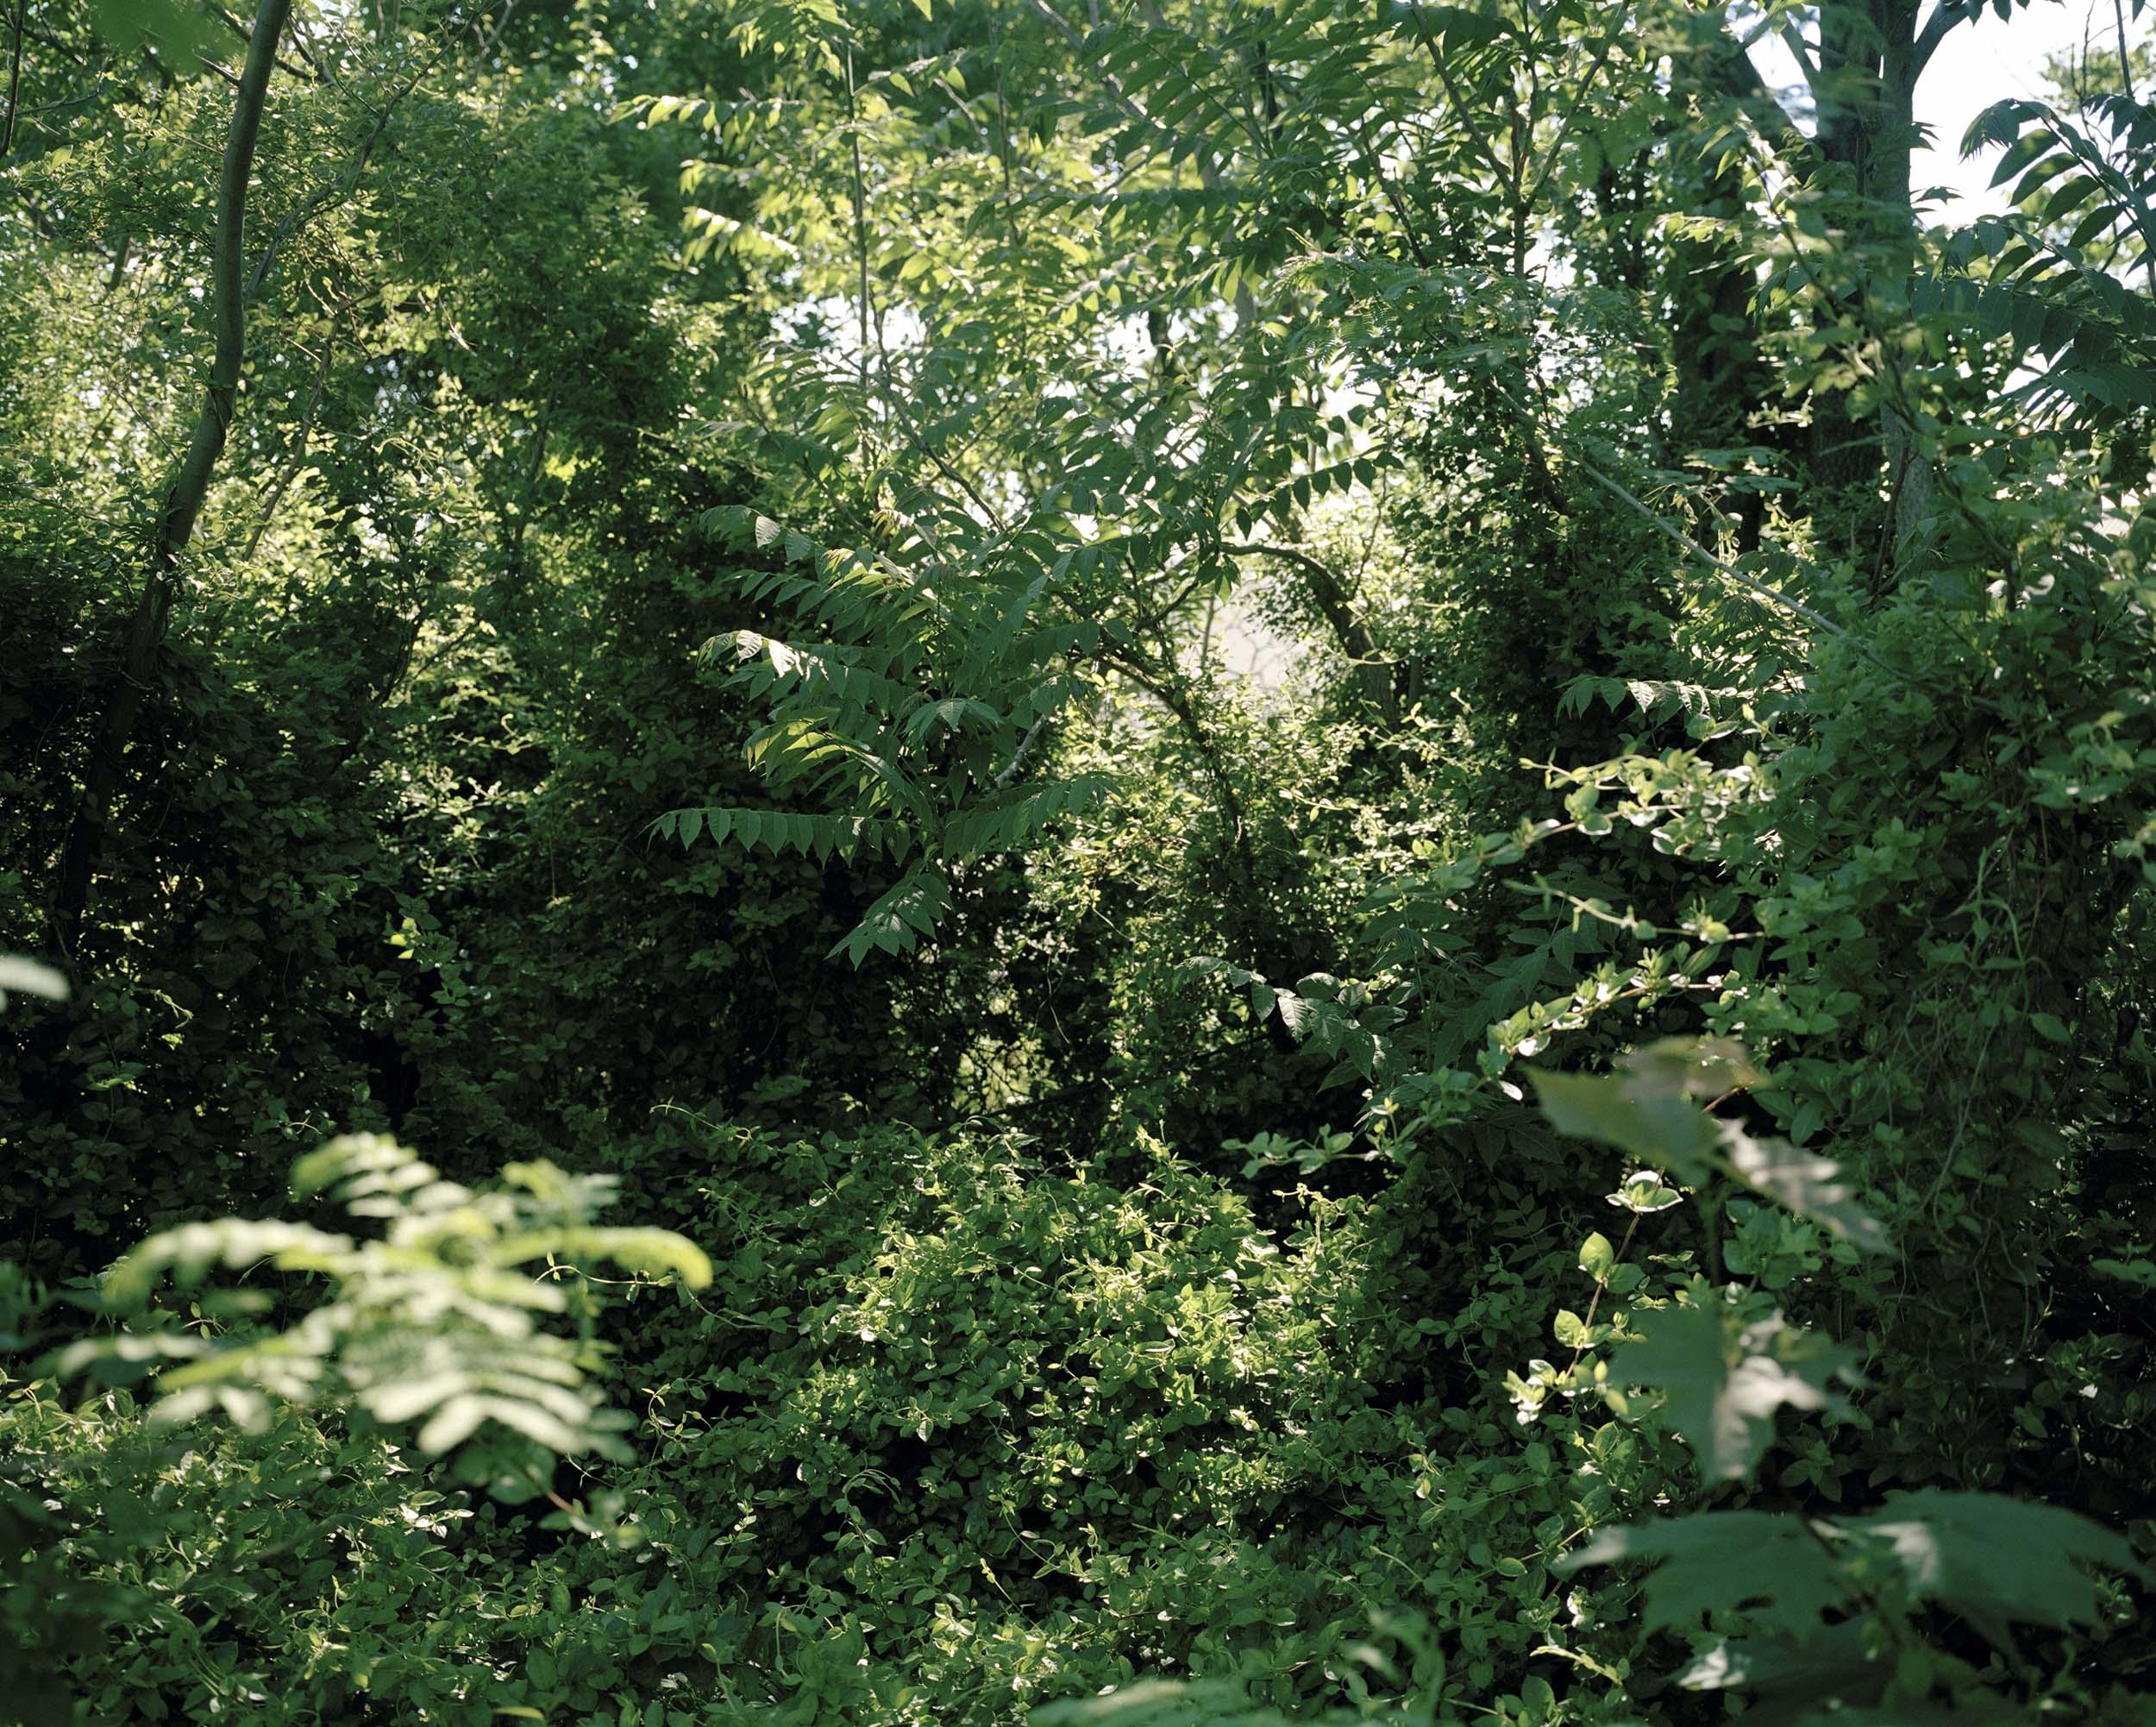 14_lush_foliage_01.jpg